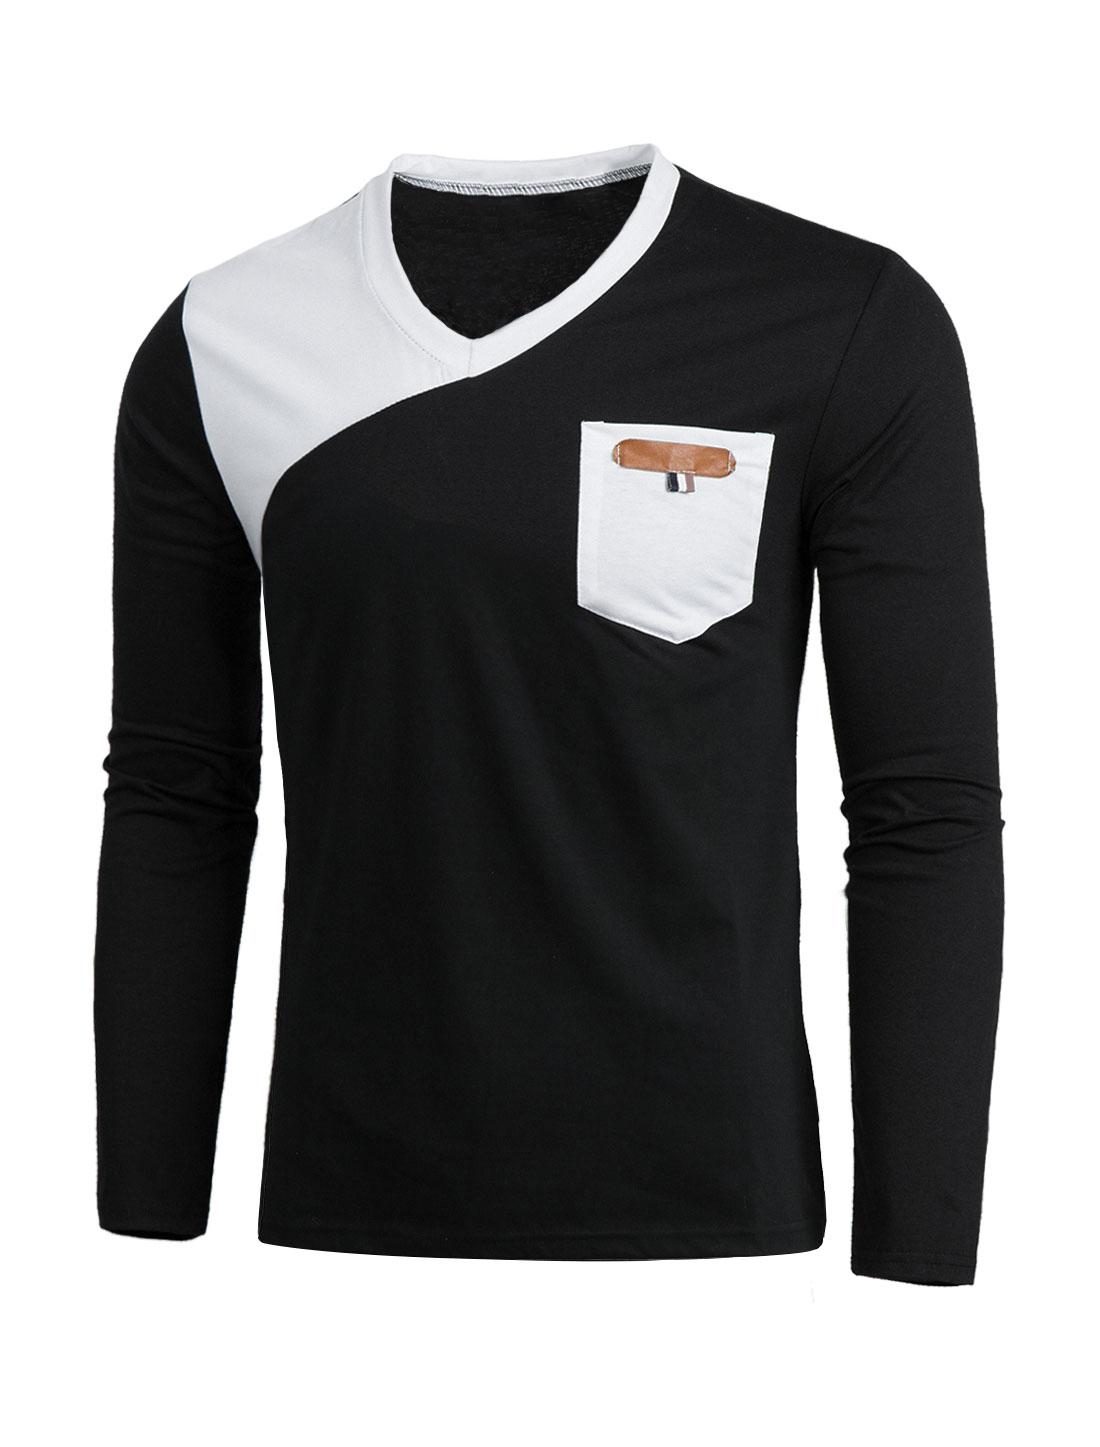 Men Casual V Neck Color Block Pocket Long Sleeves Slim Fit Tee T-Shirt Black S